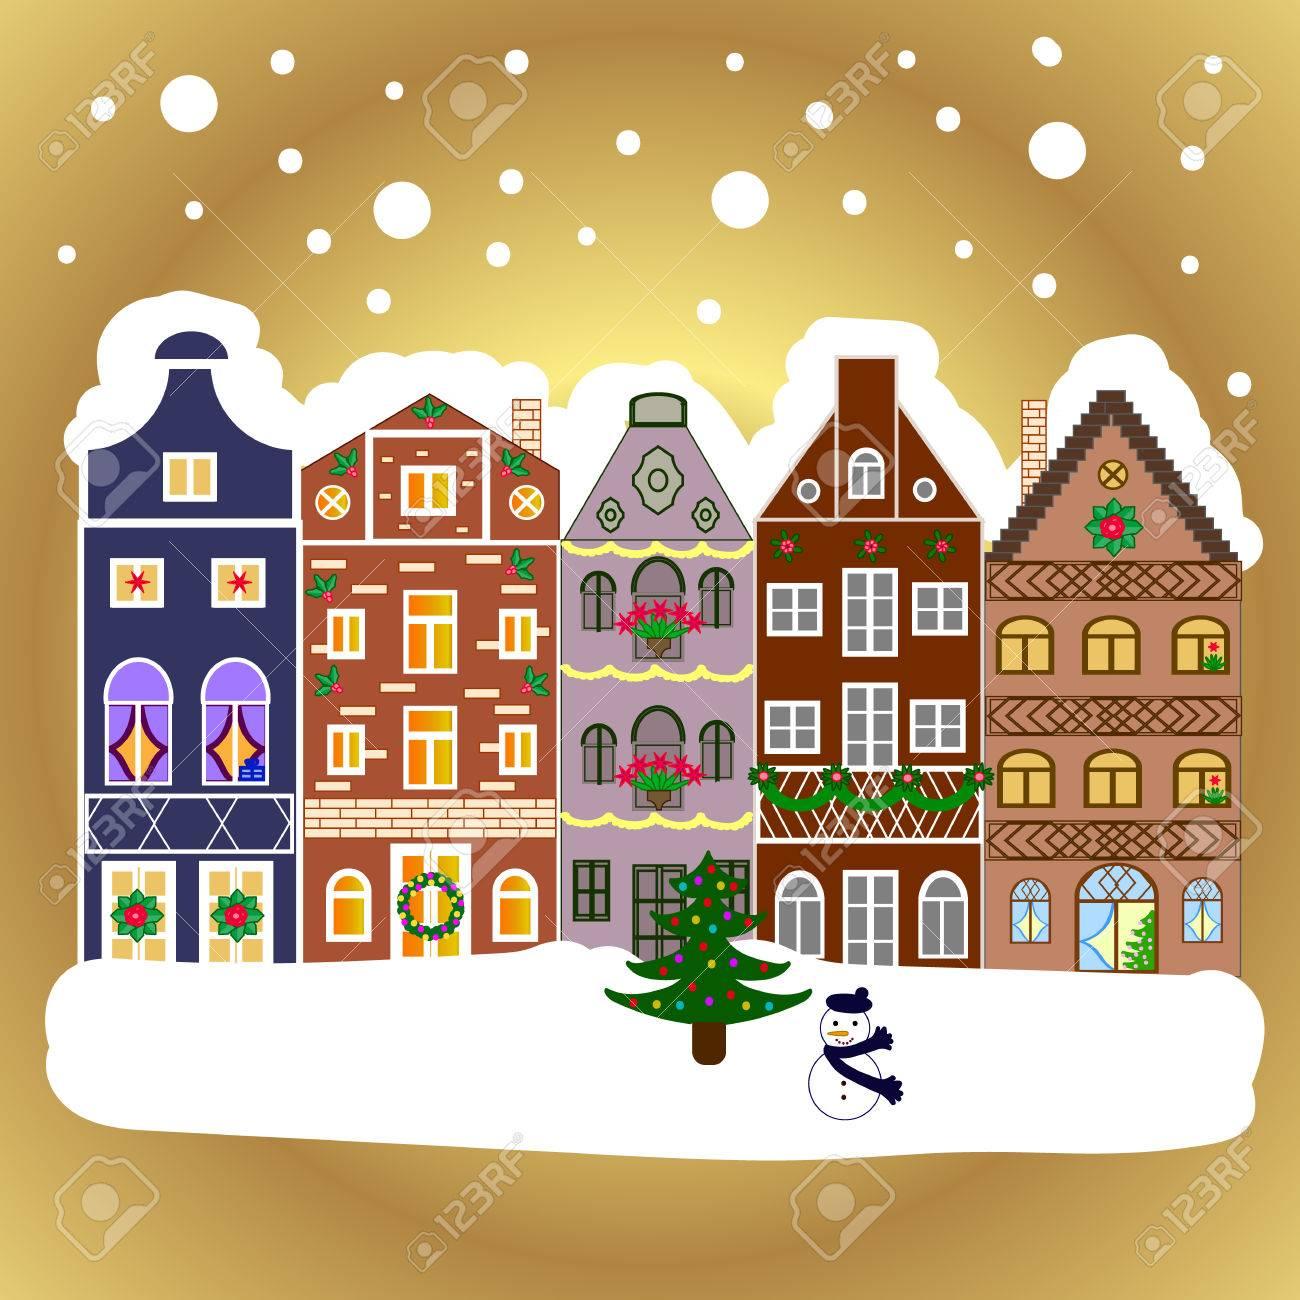 Christmas house with snow art - Evening Village Winter Landscape With Snow Cove Houses Christmas Winter Scene